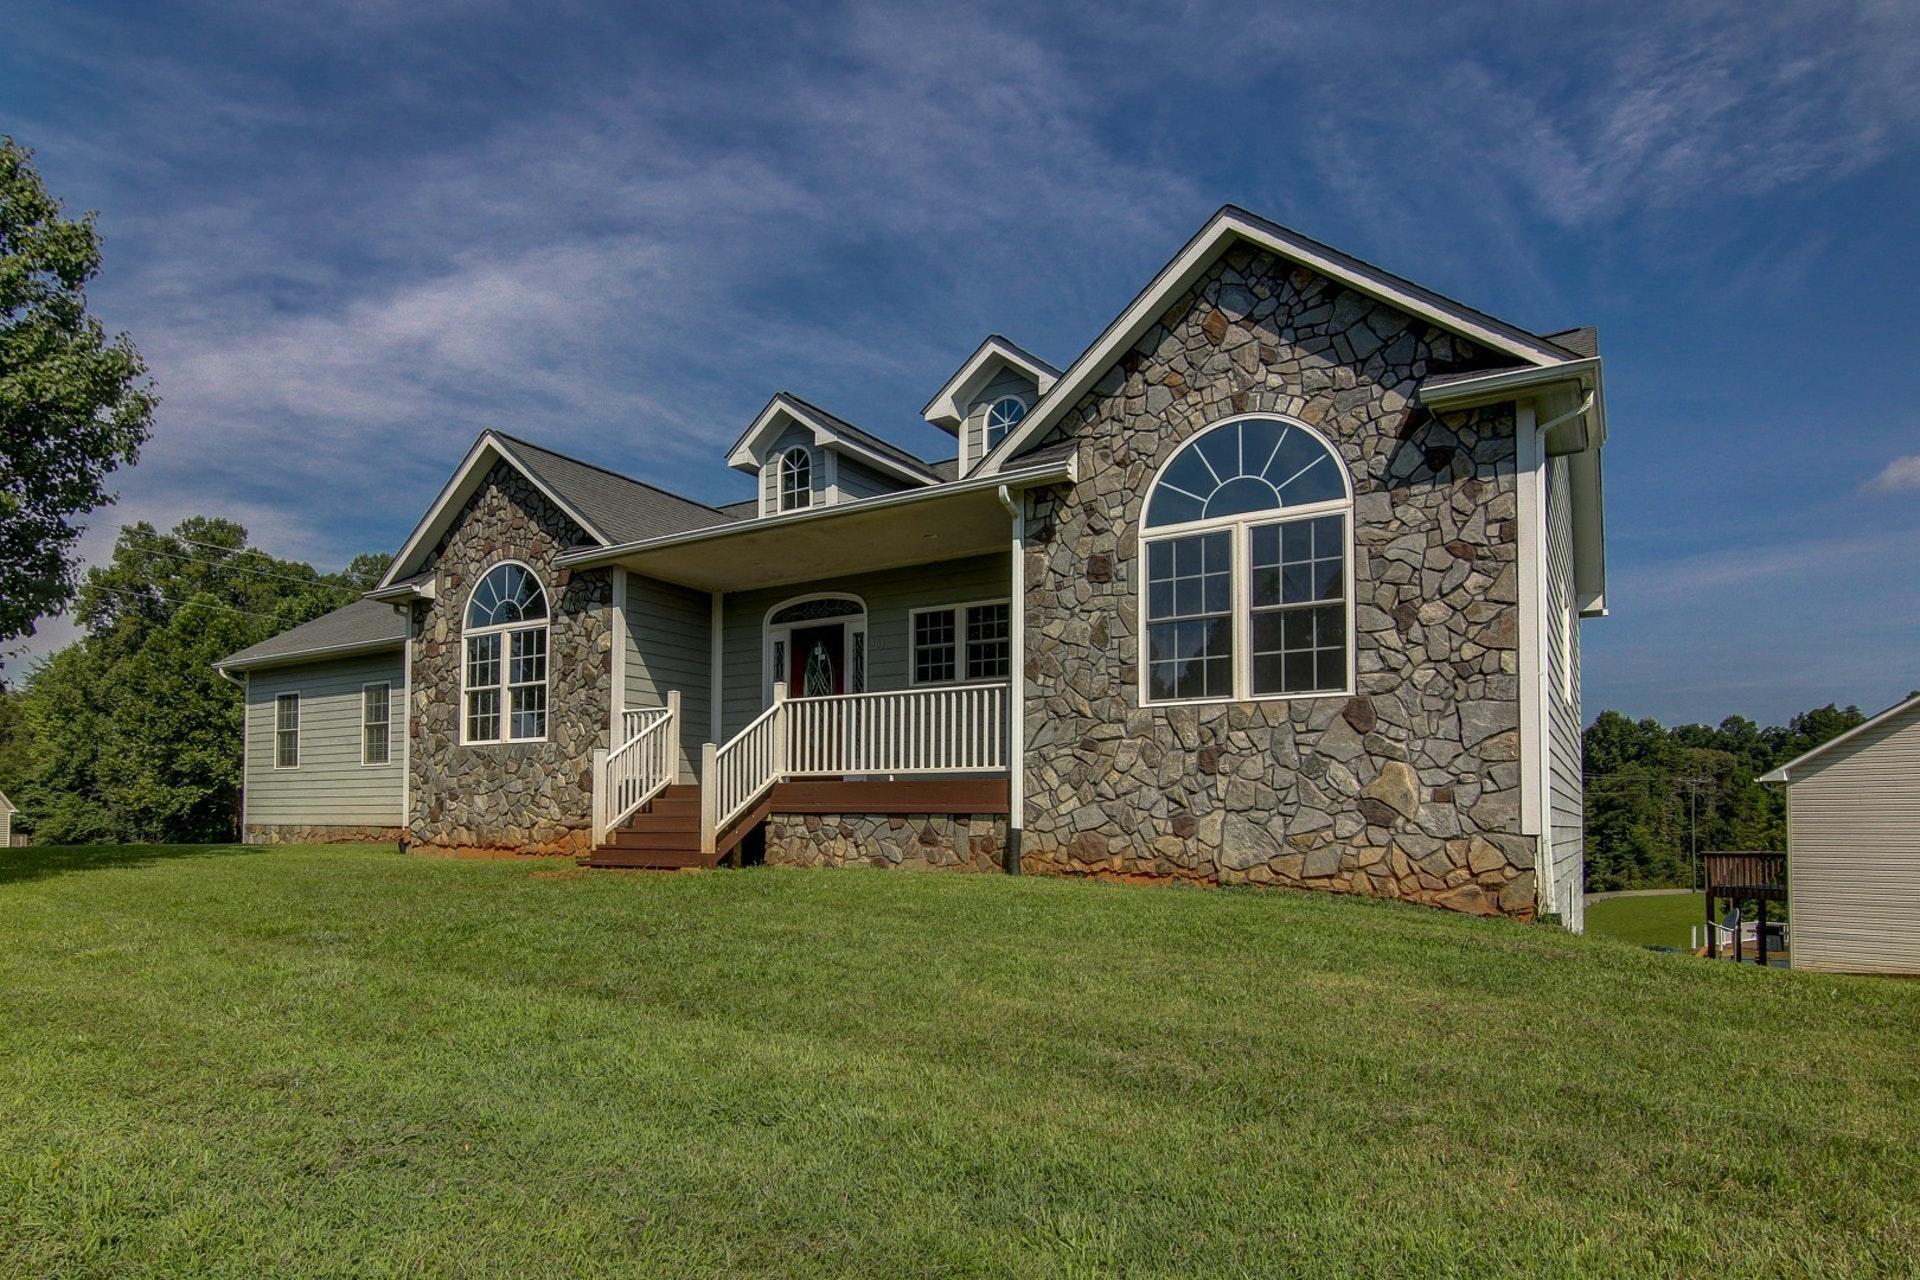 101 Little Creek RD, Moneta, VA 24121